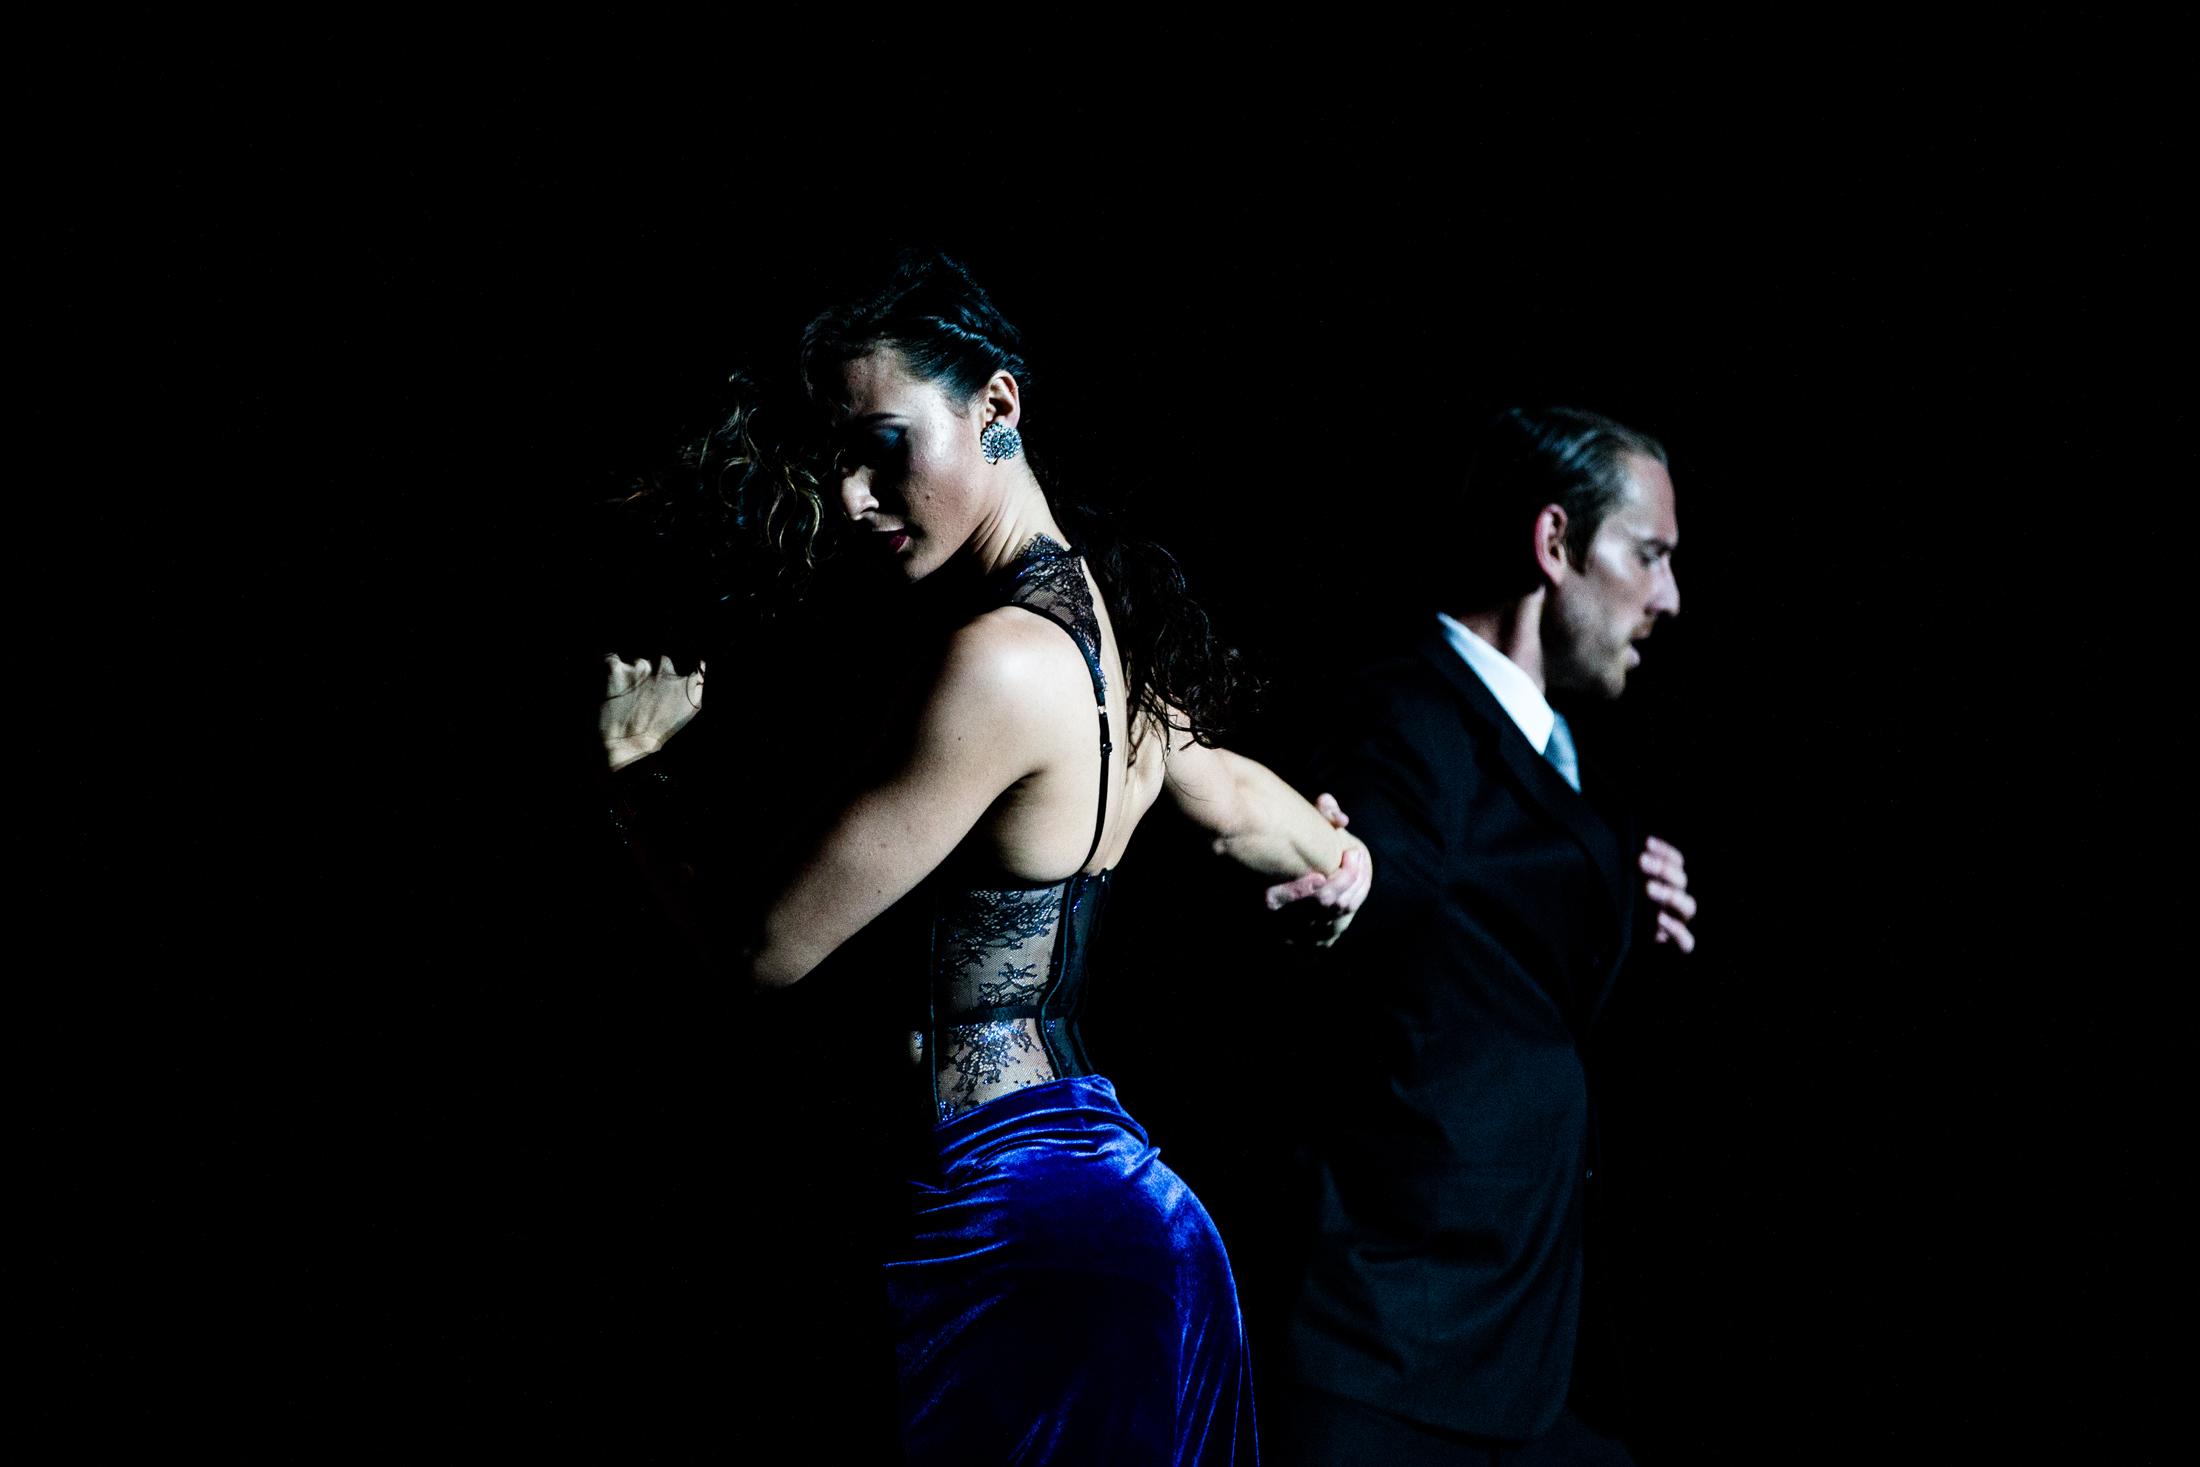 tango-show-performance-budani-04.jpg